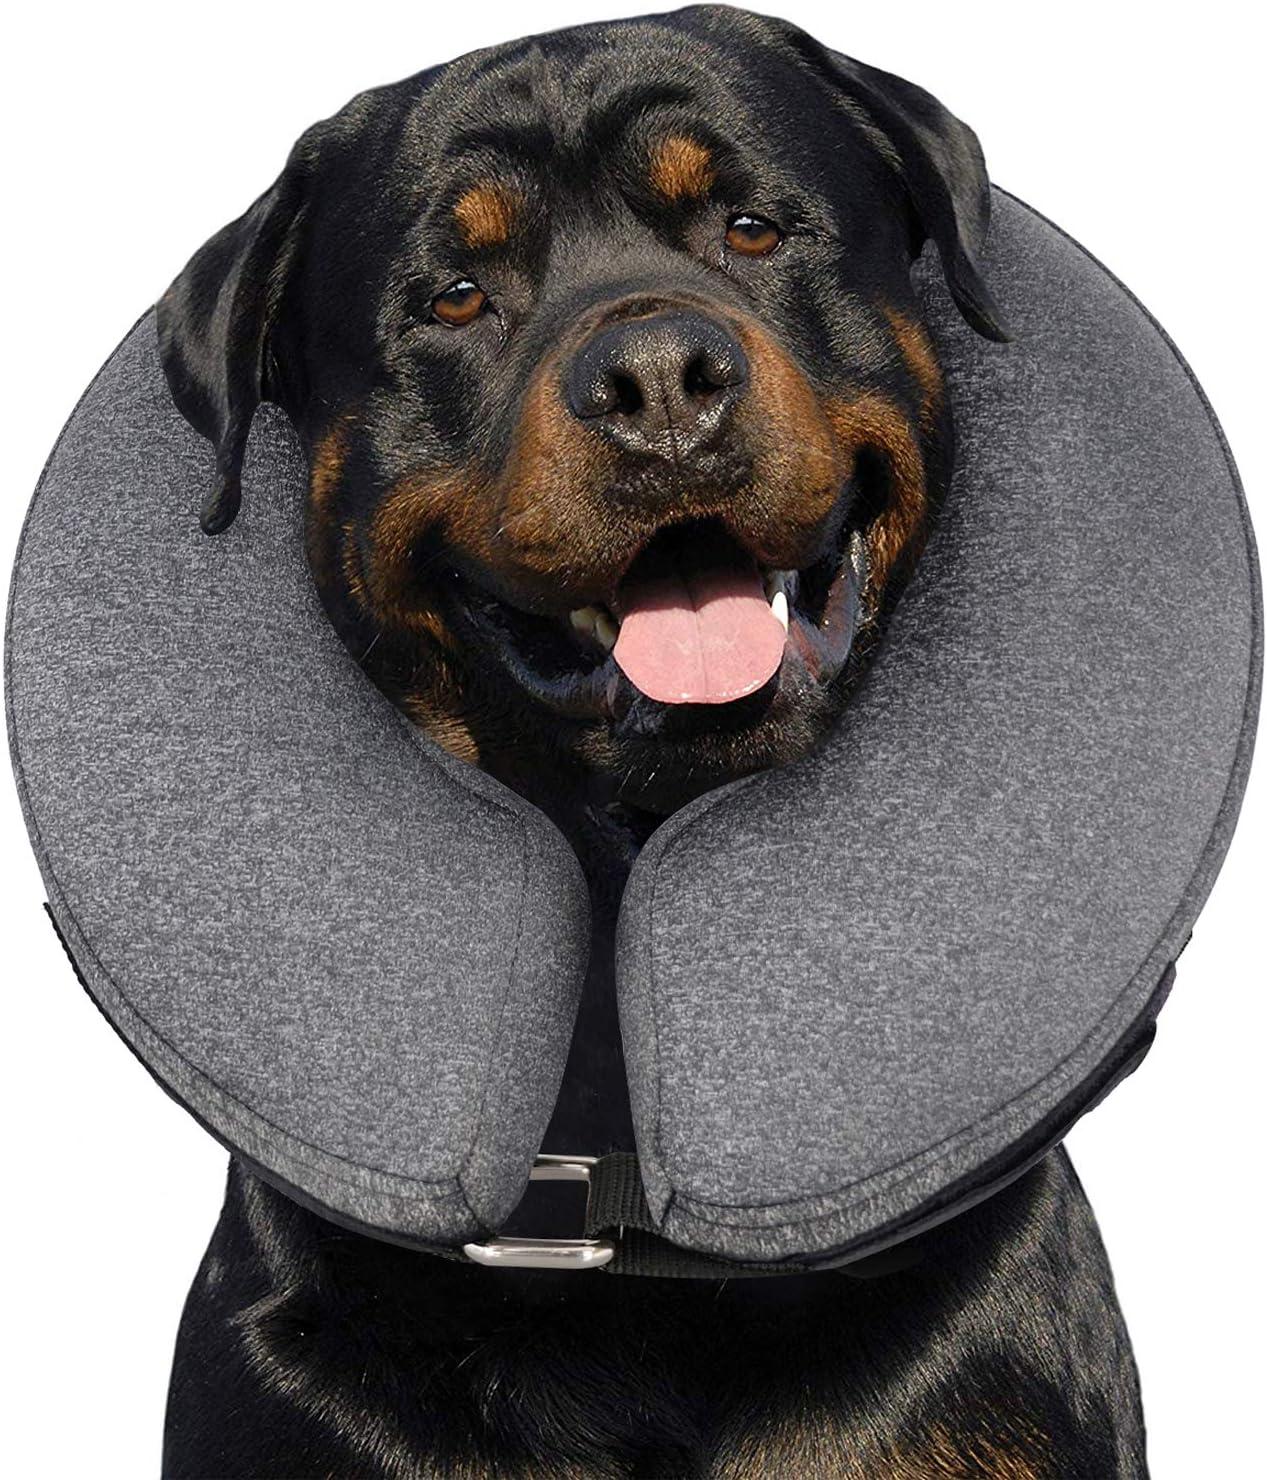 81n0ooDVguL. AC SL1500 Inflatable Dog Collar Reviews